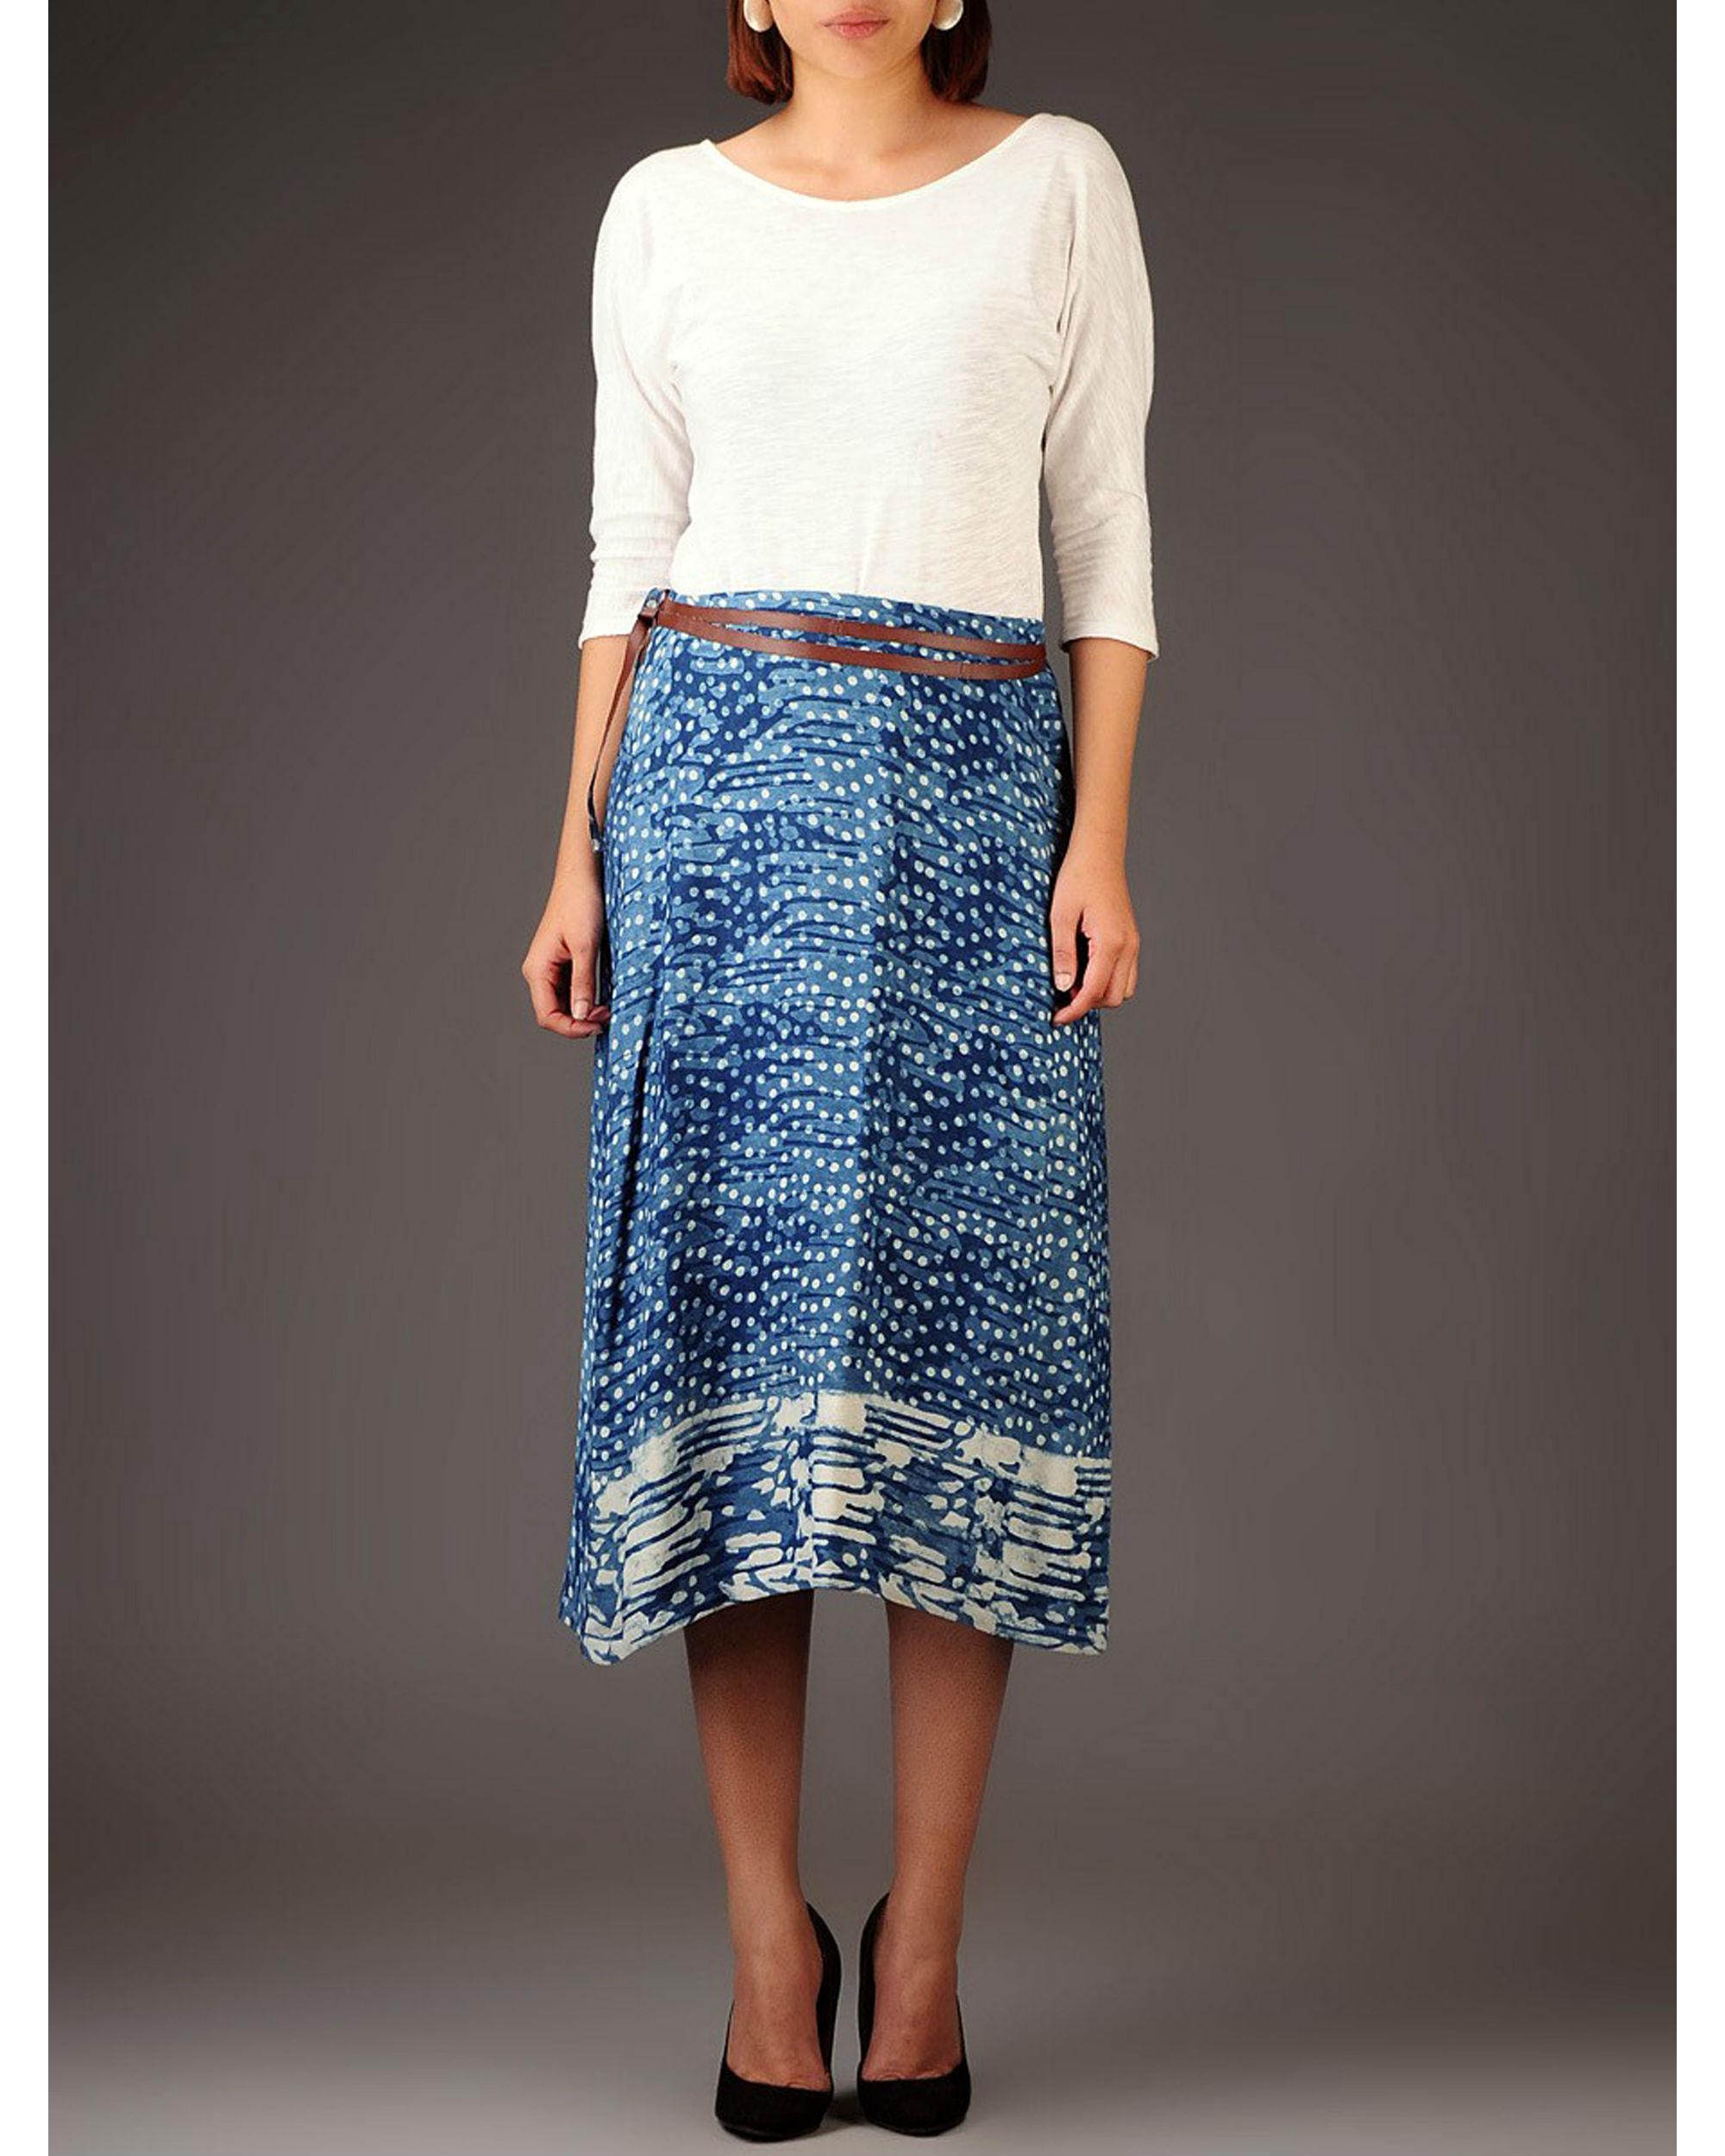 Indigo wrap skirt with pockets